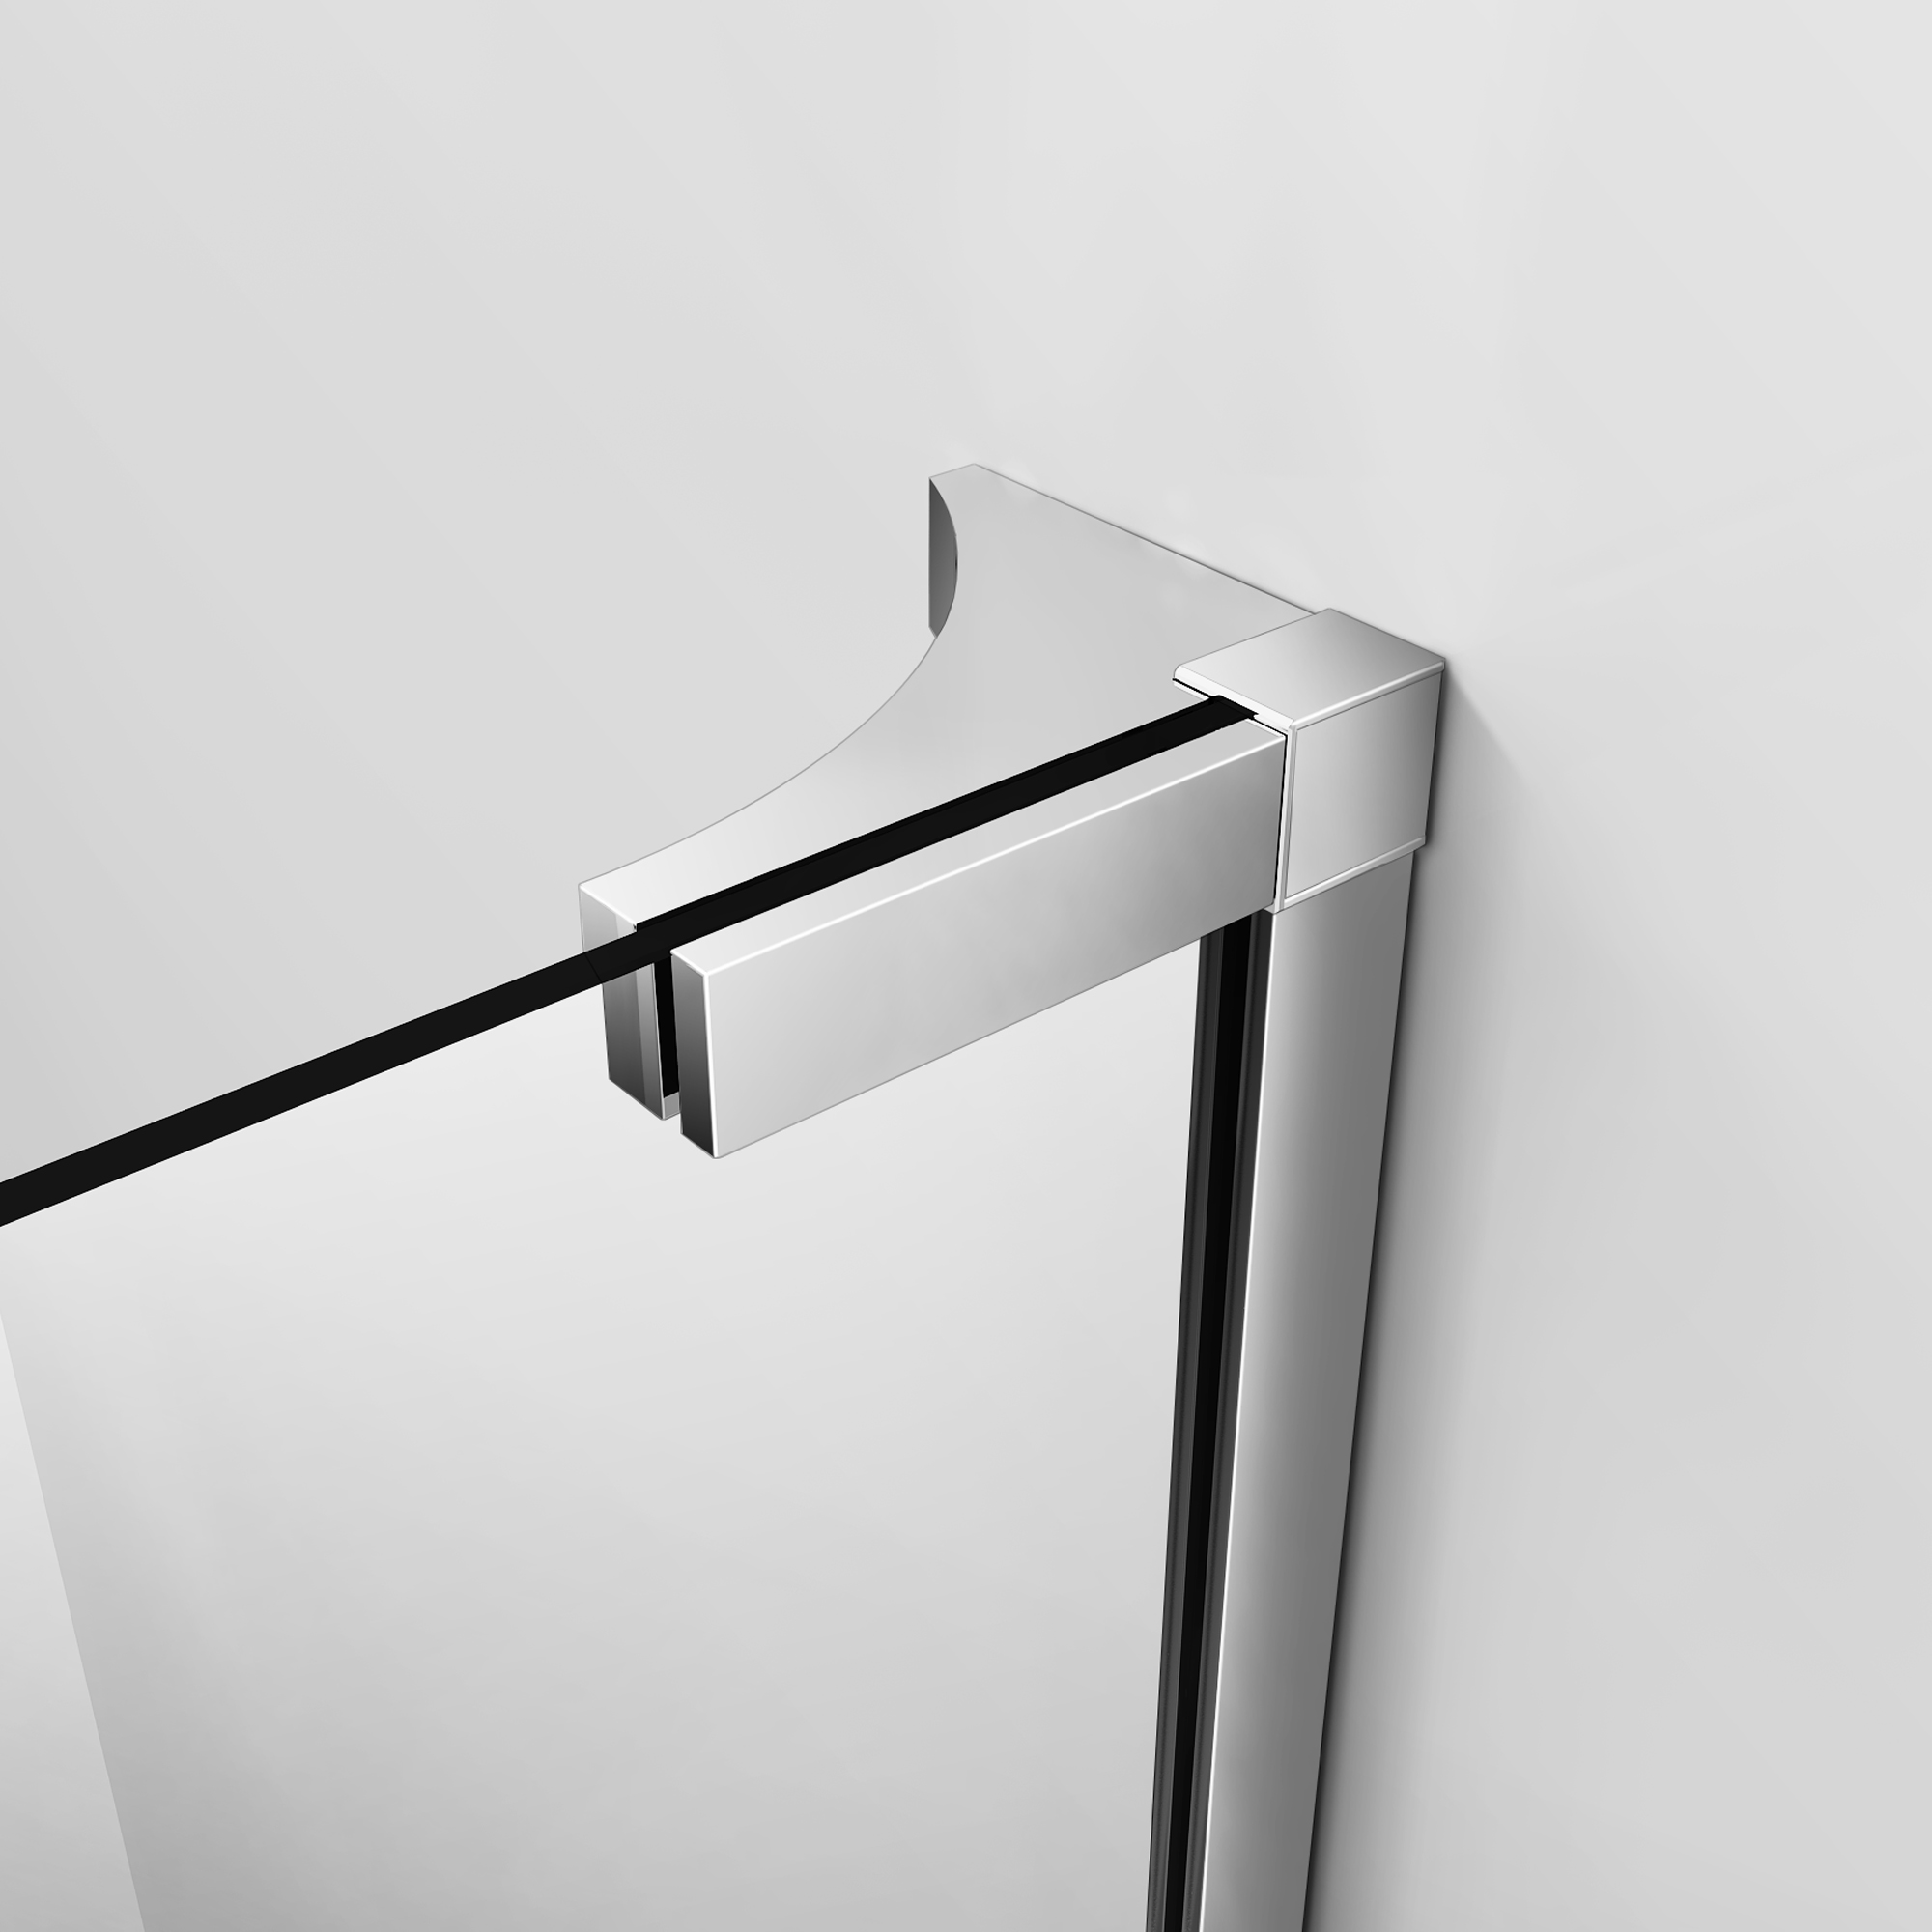 L Shape Wet Room Shower Enclosure Walk In Glass Cubicle